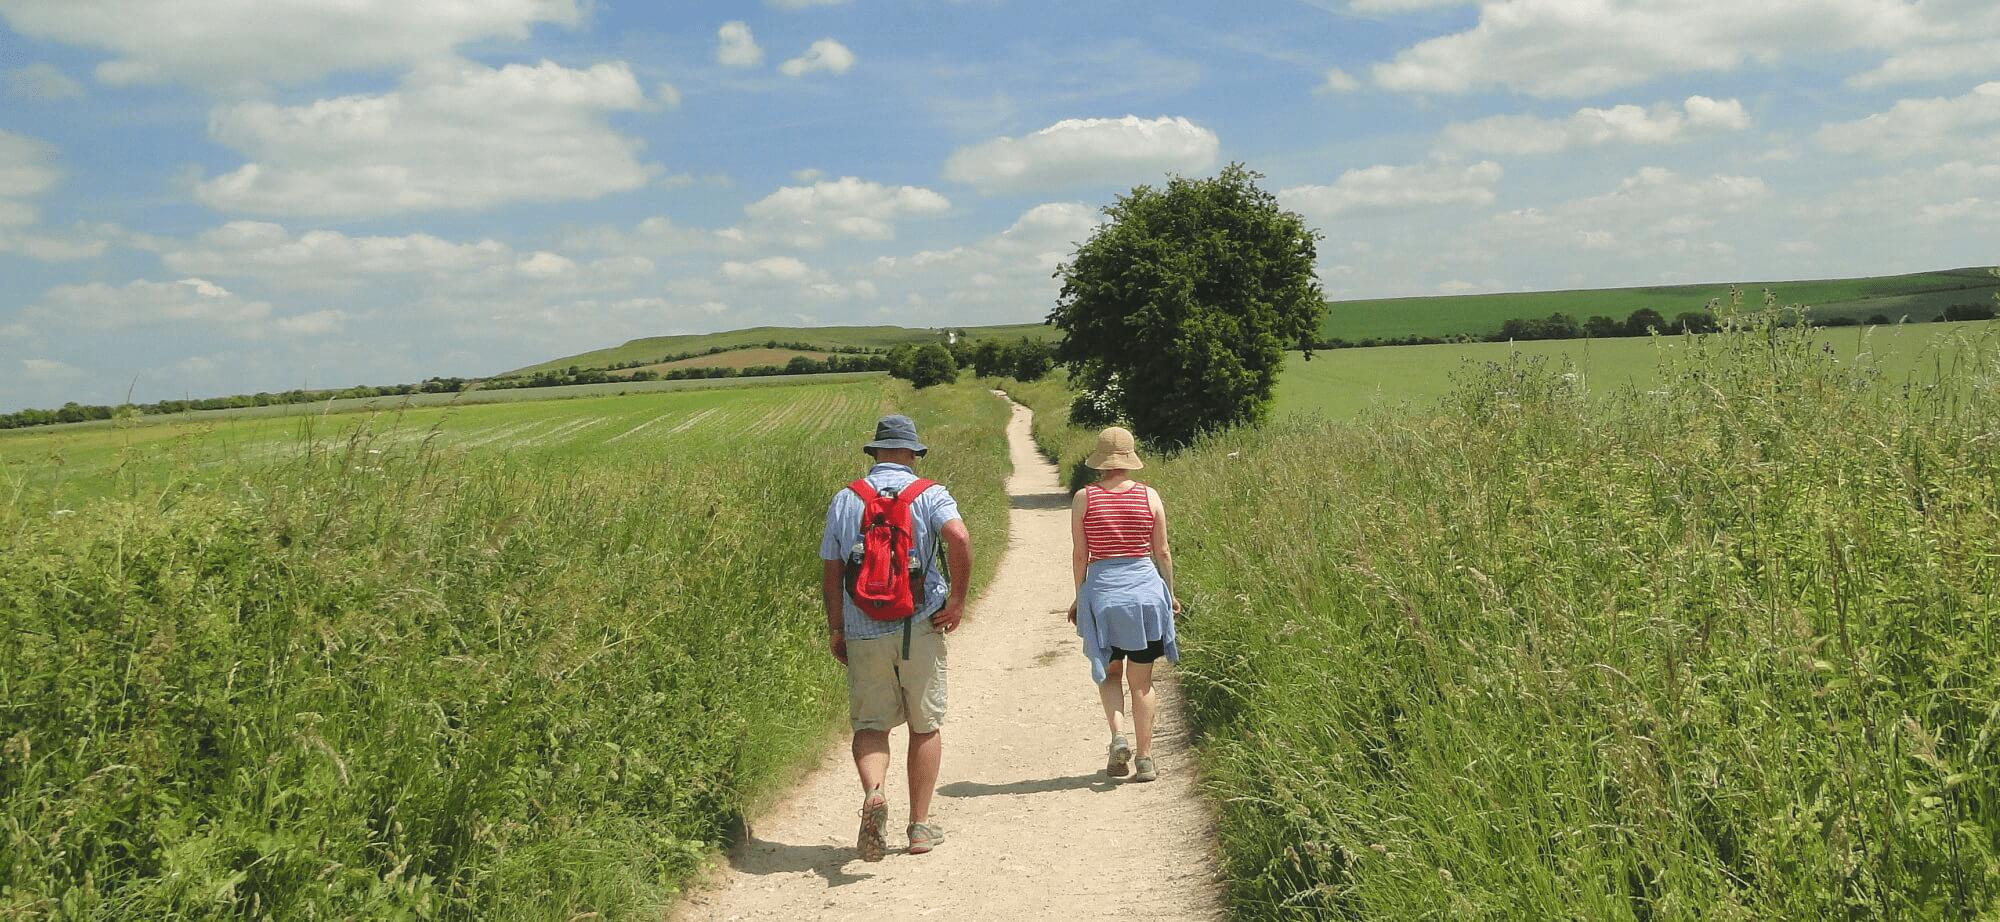 Walkers-on-the-Ridgeway